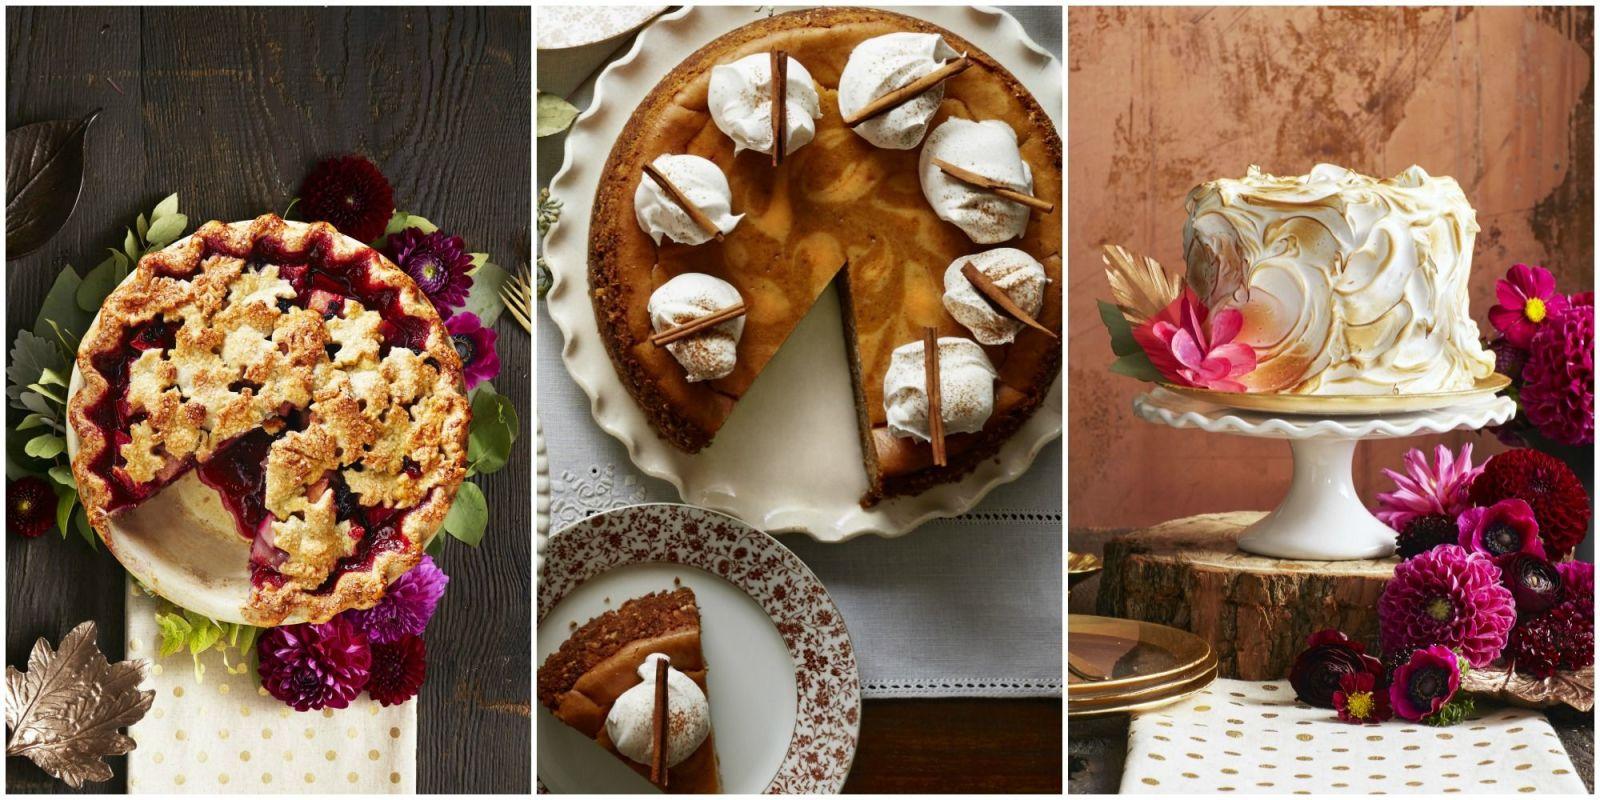 「desserts」的圖片搜尋結果